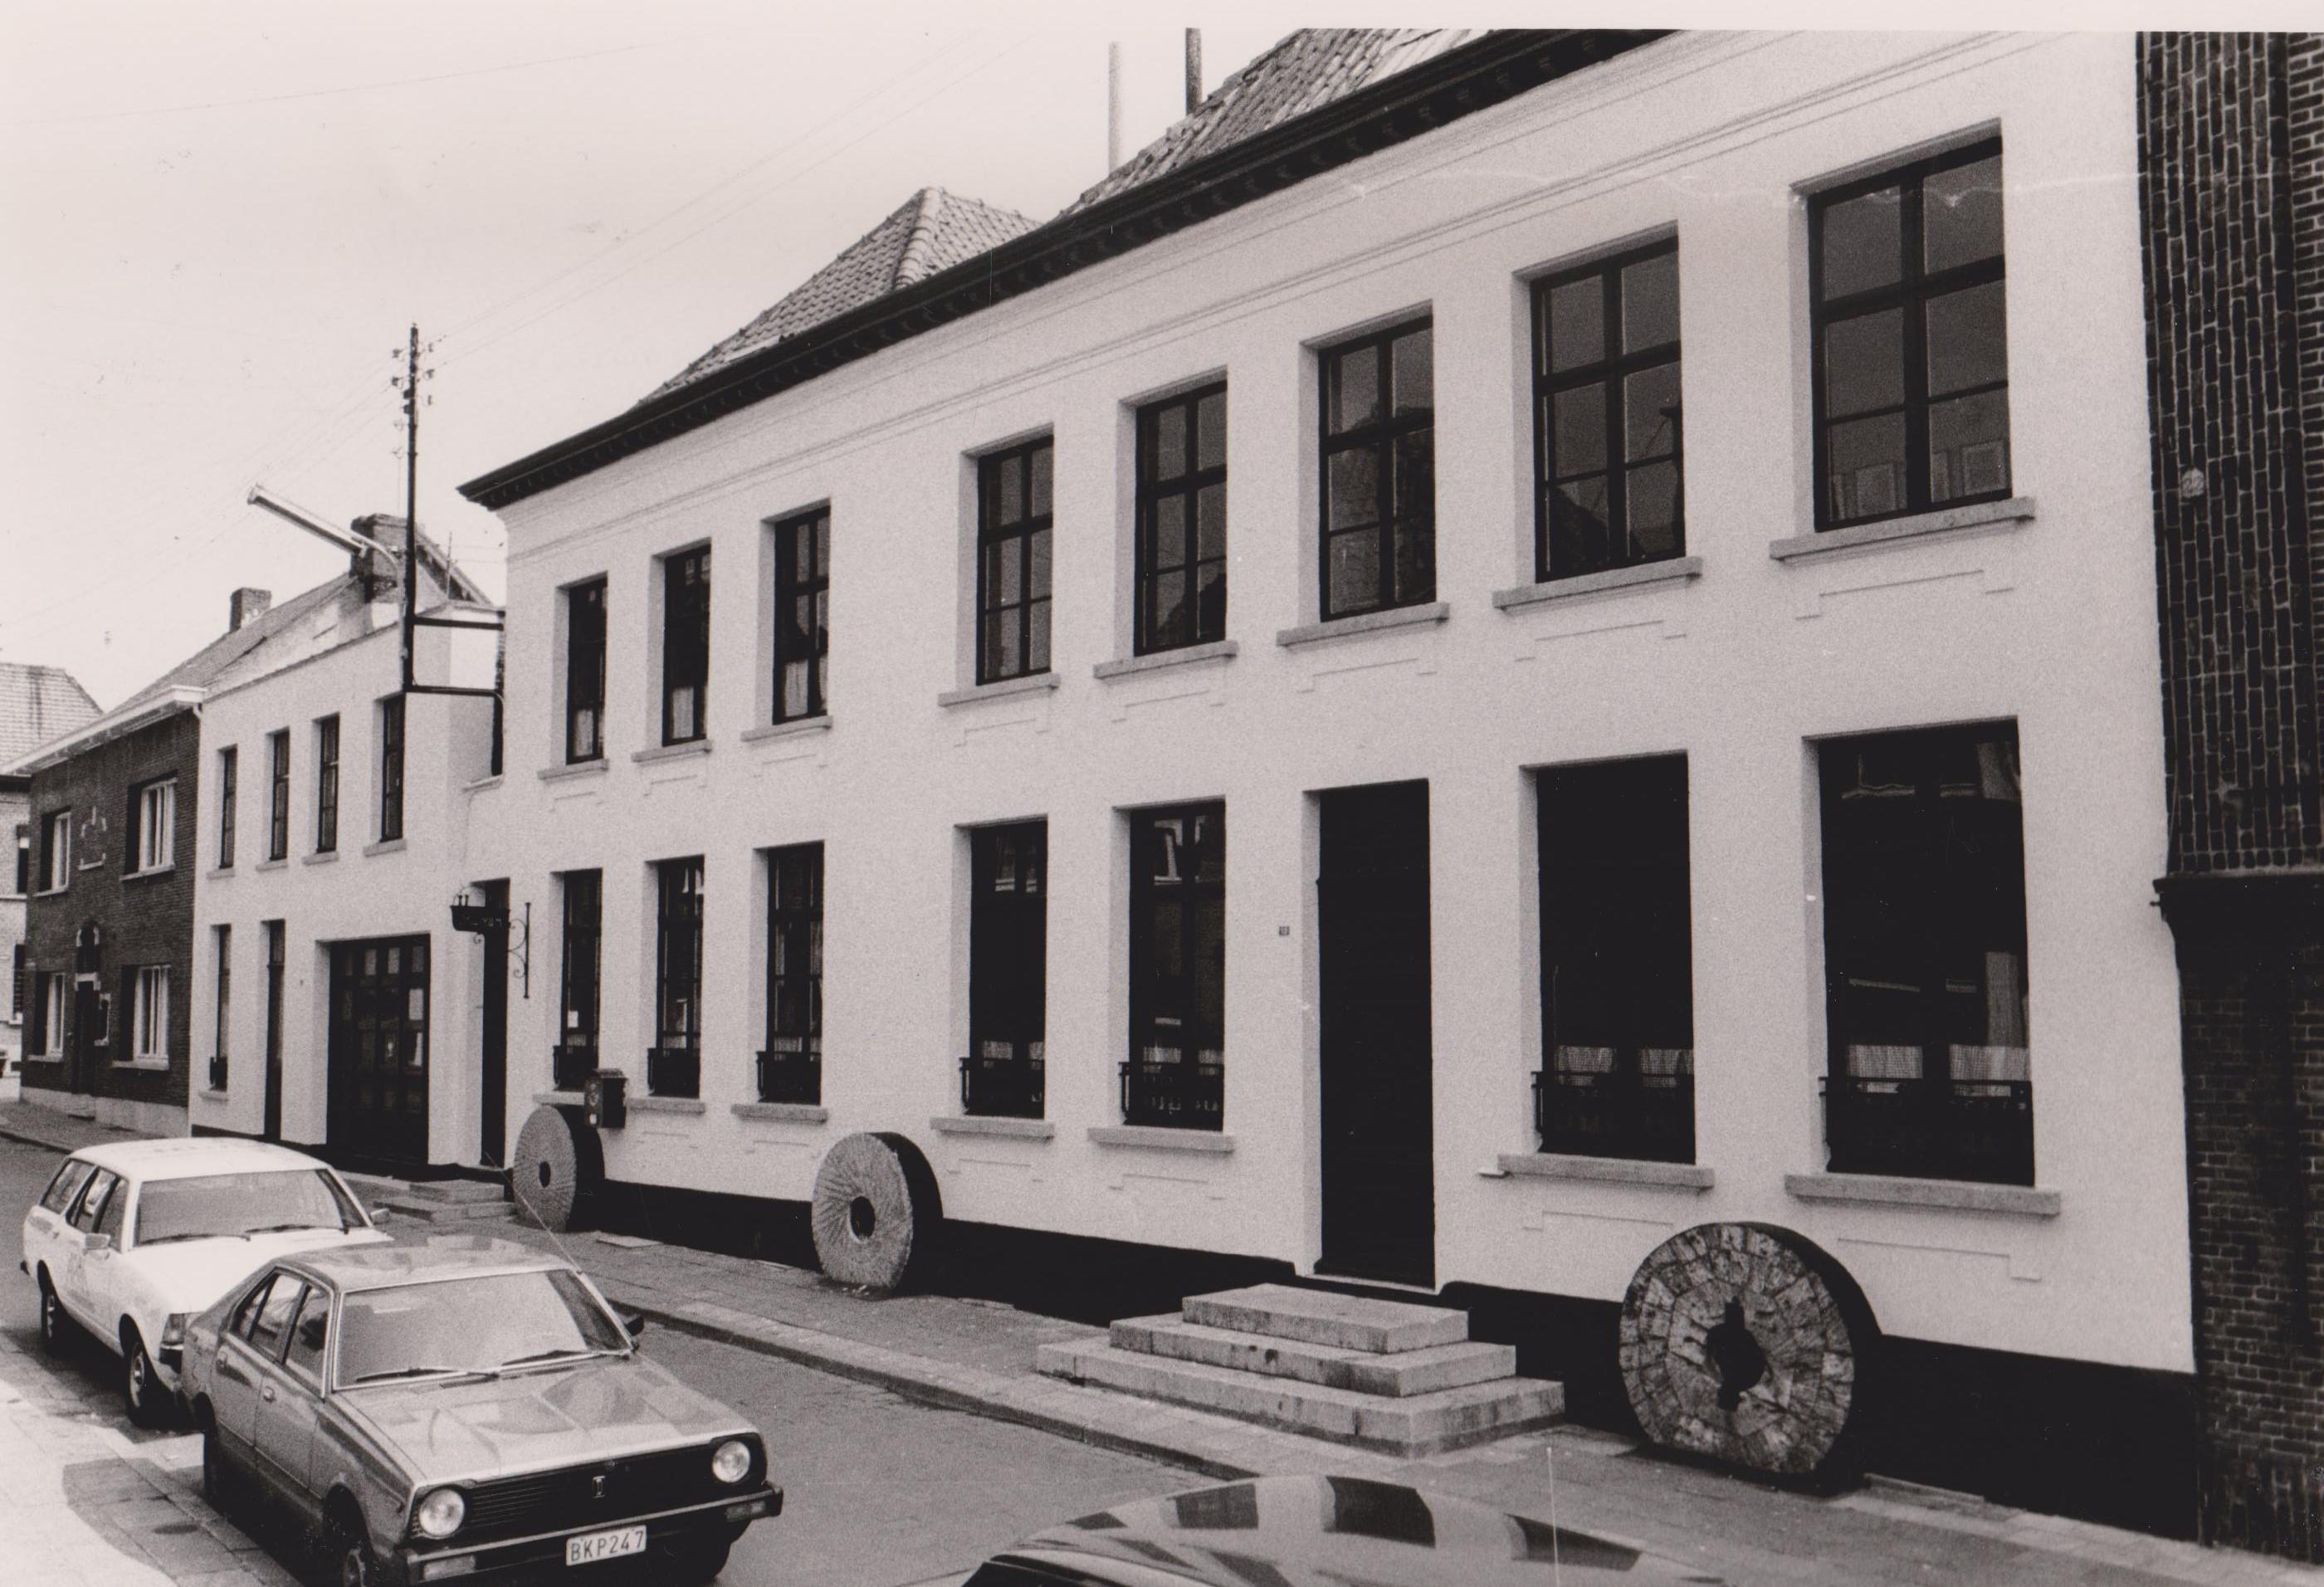 Poldermuseum Lillo 55 jaar jong